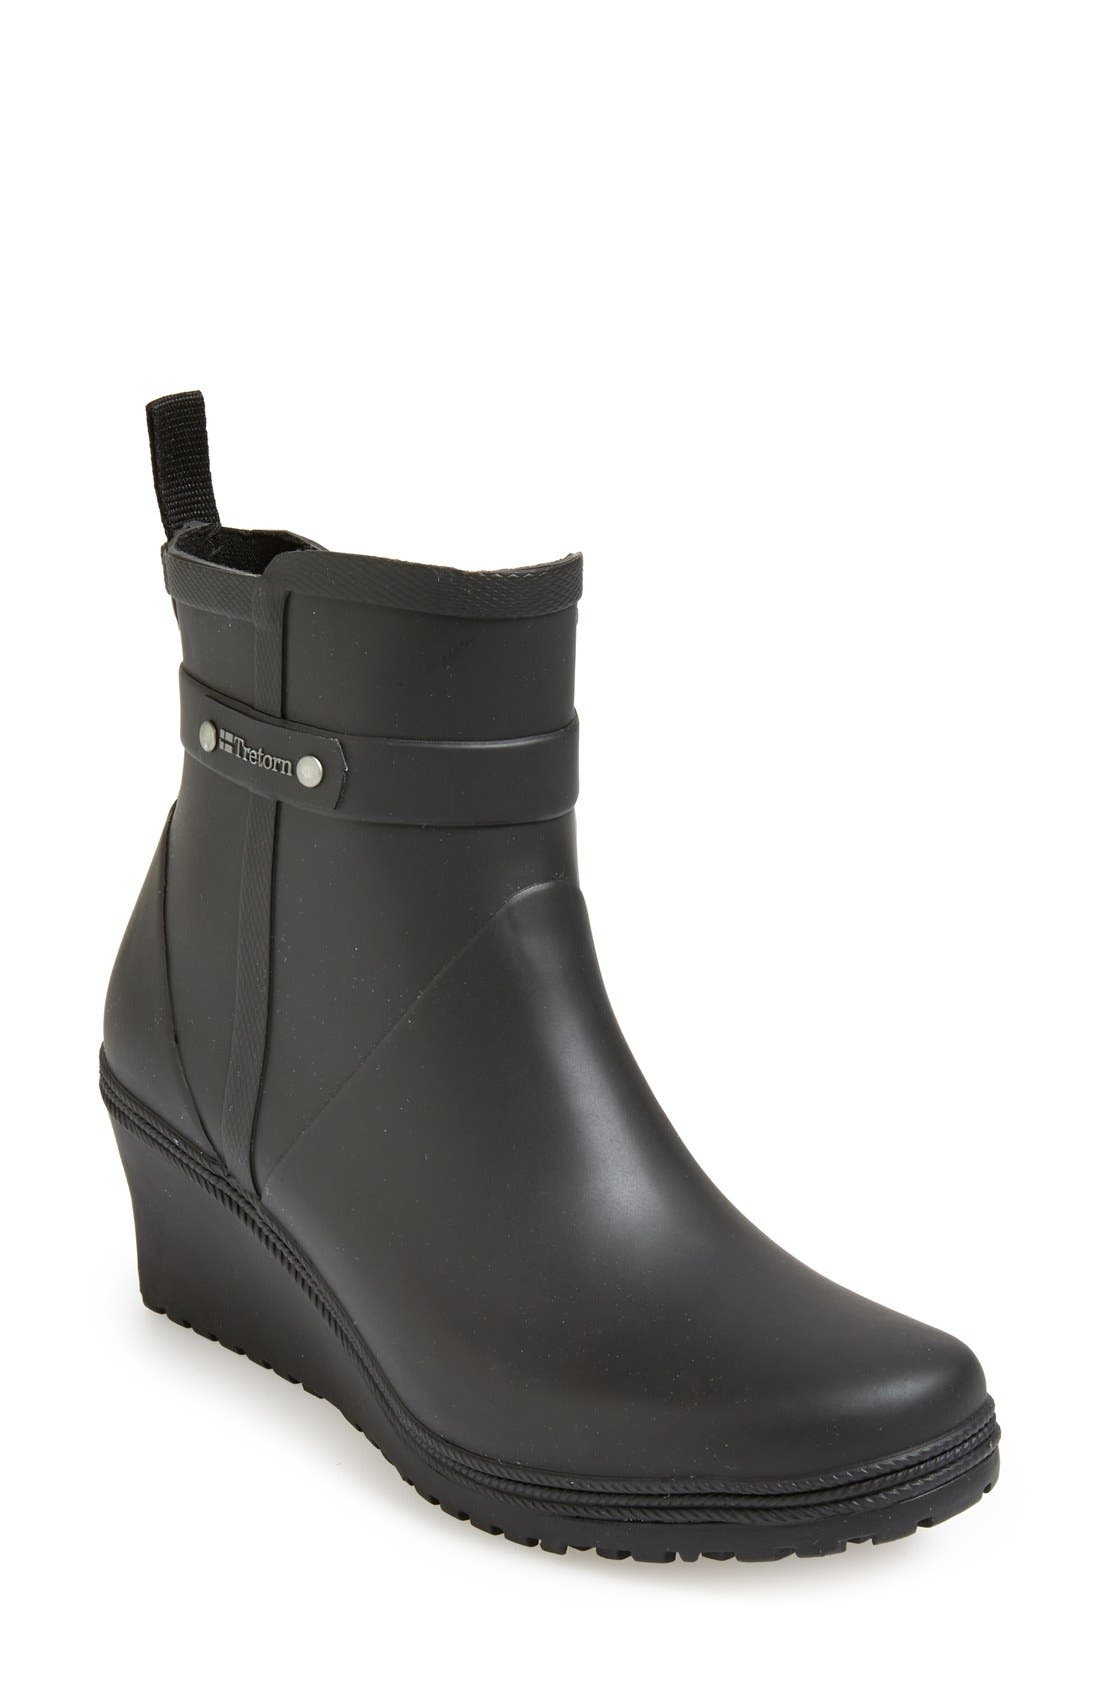 Main Image - Tretorn 'Plask' Rain Boot (Women)